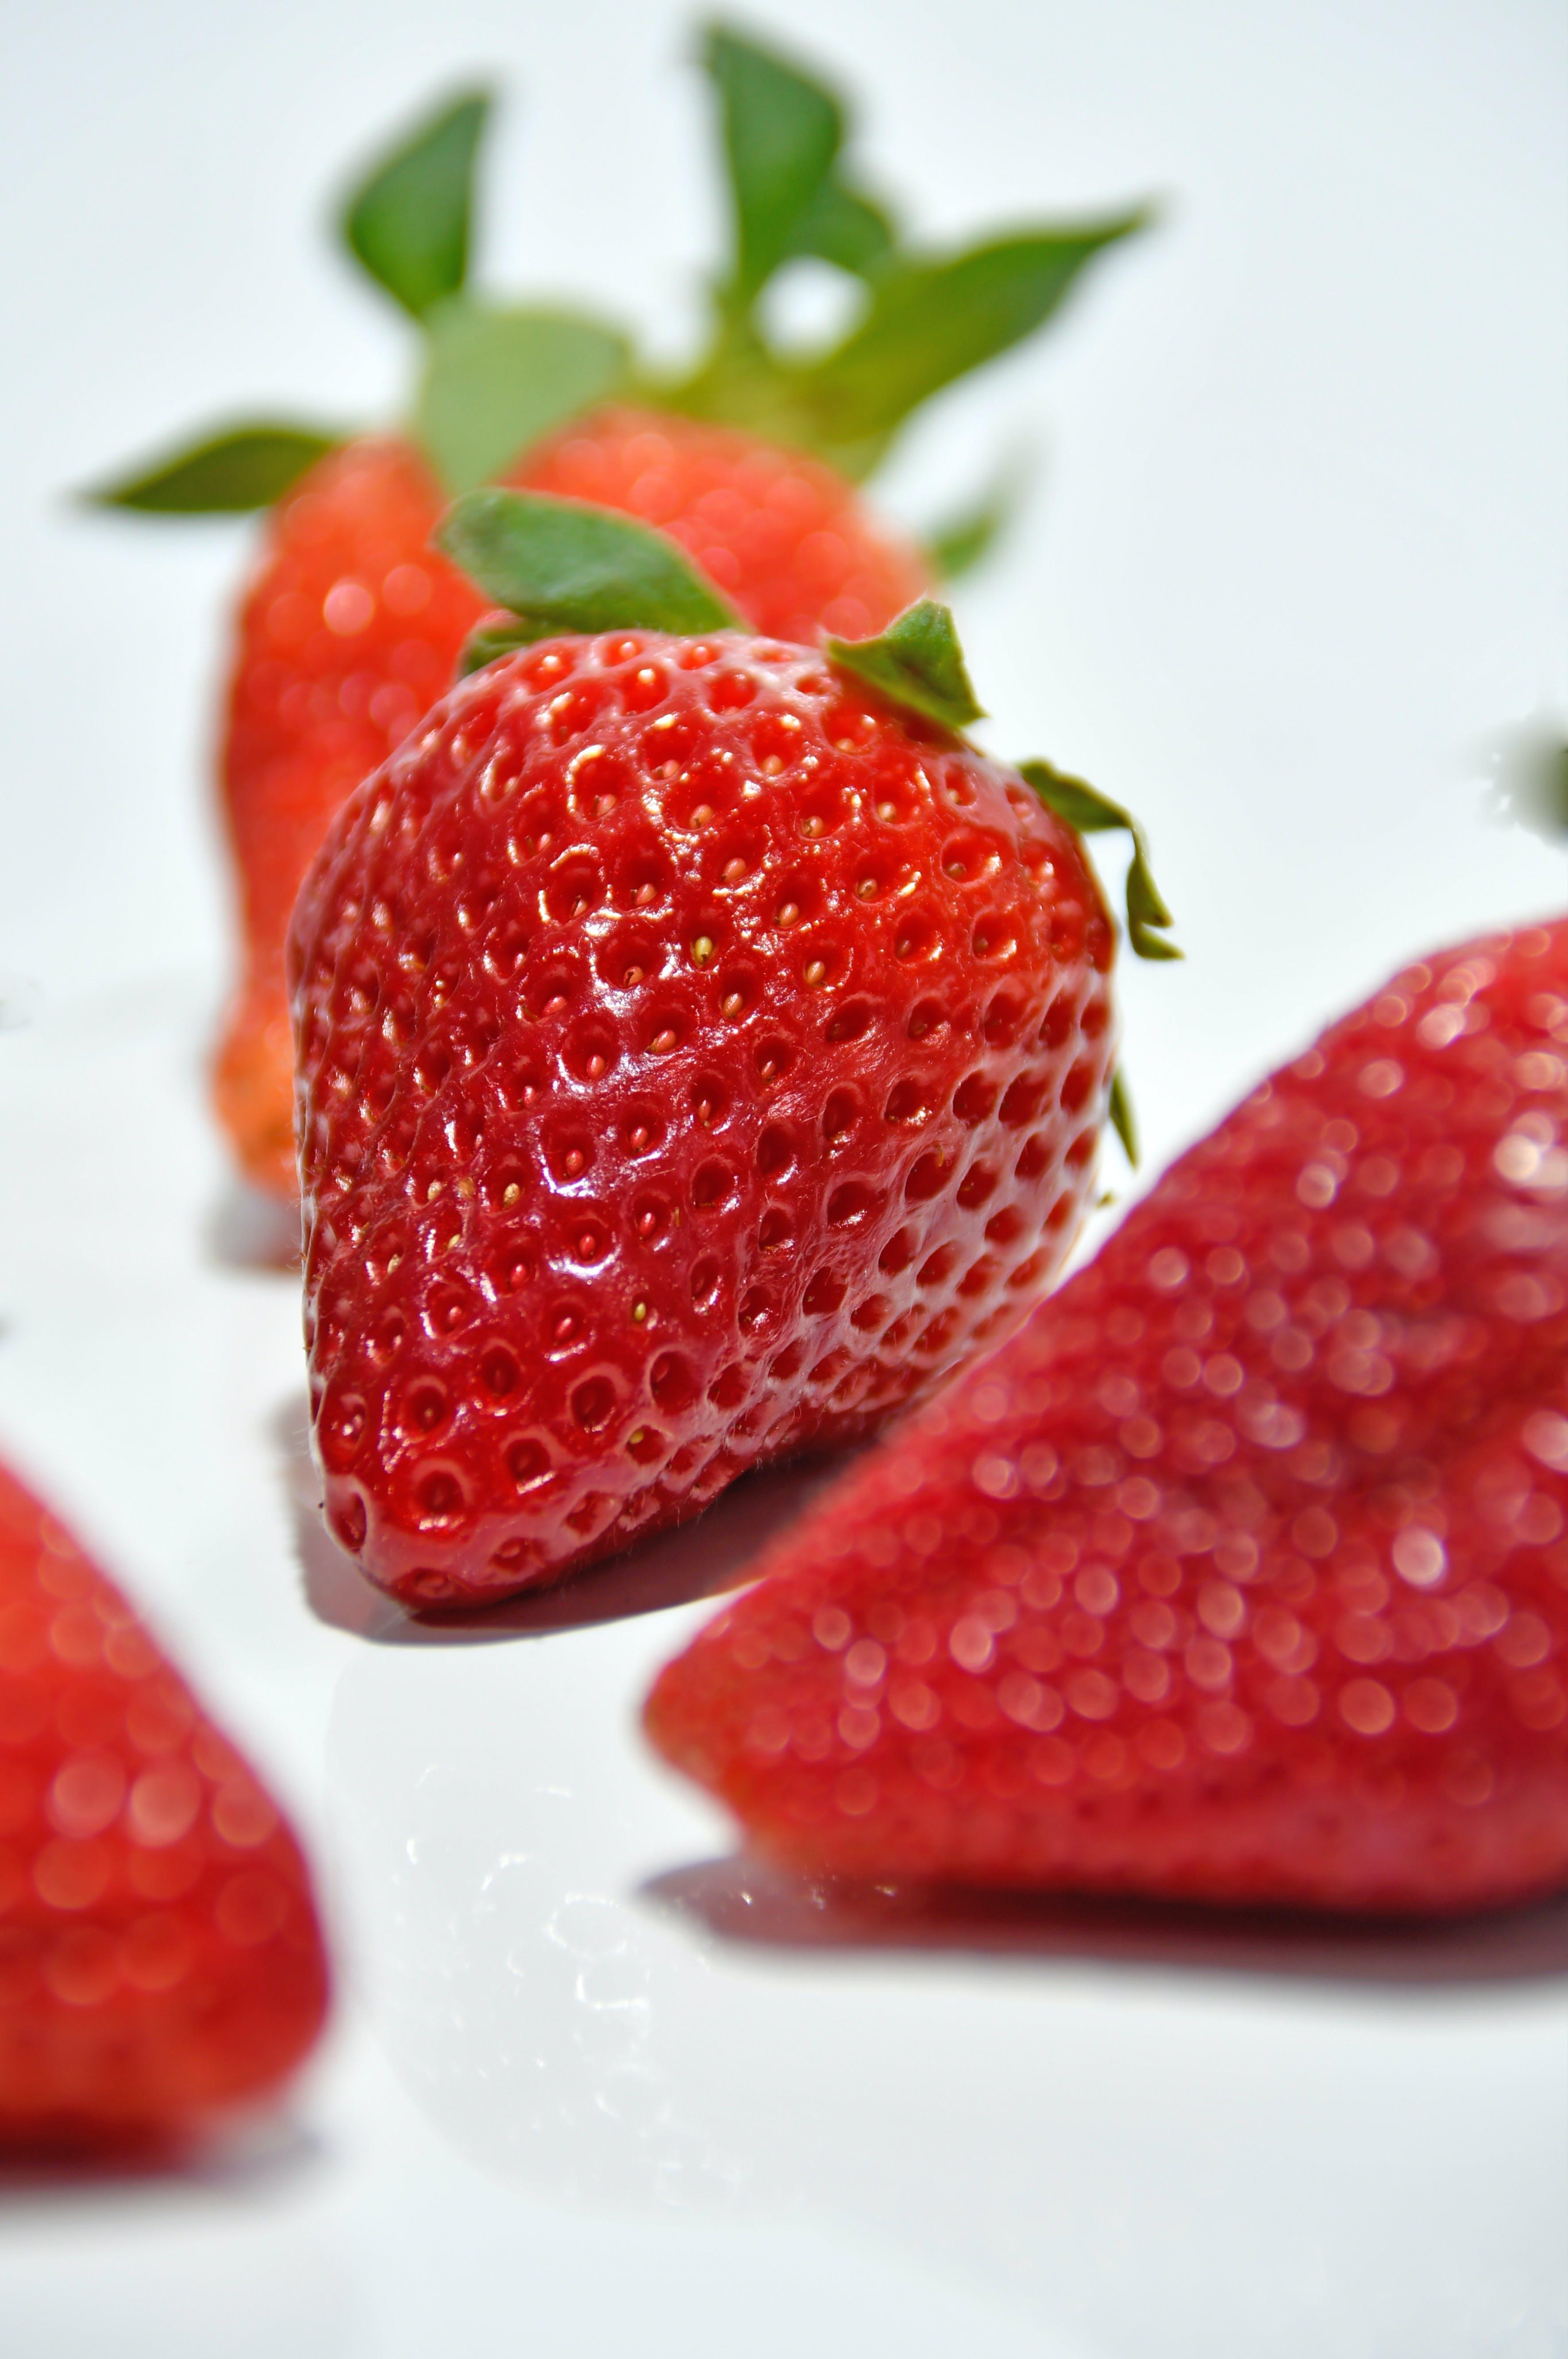 Kostenloses Stock Foto zu beere, dessert, diät, erdbeere